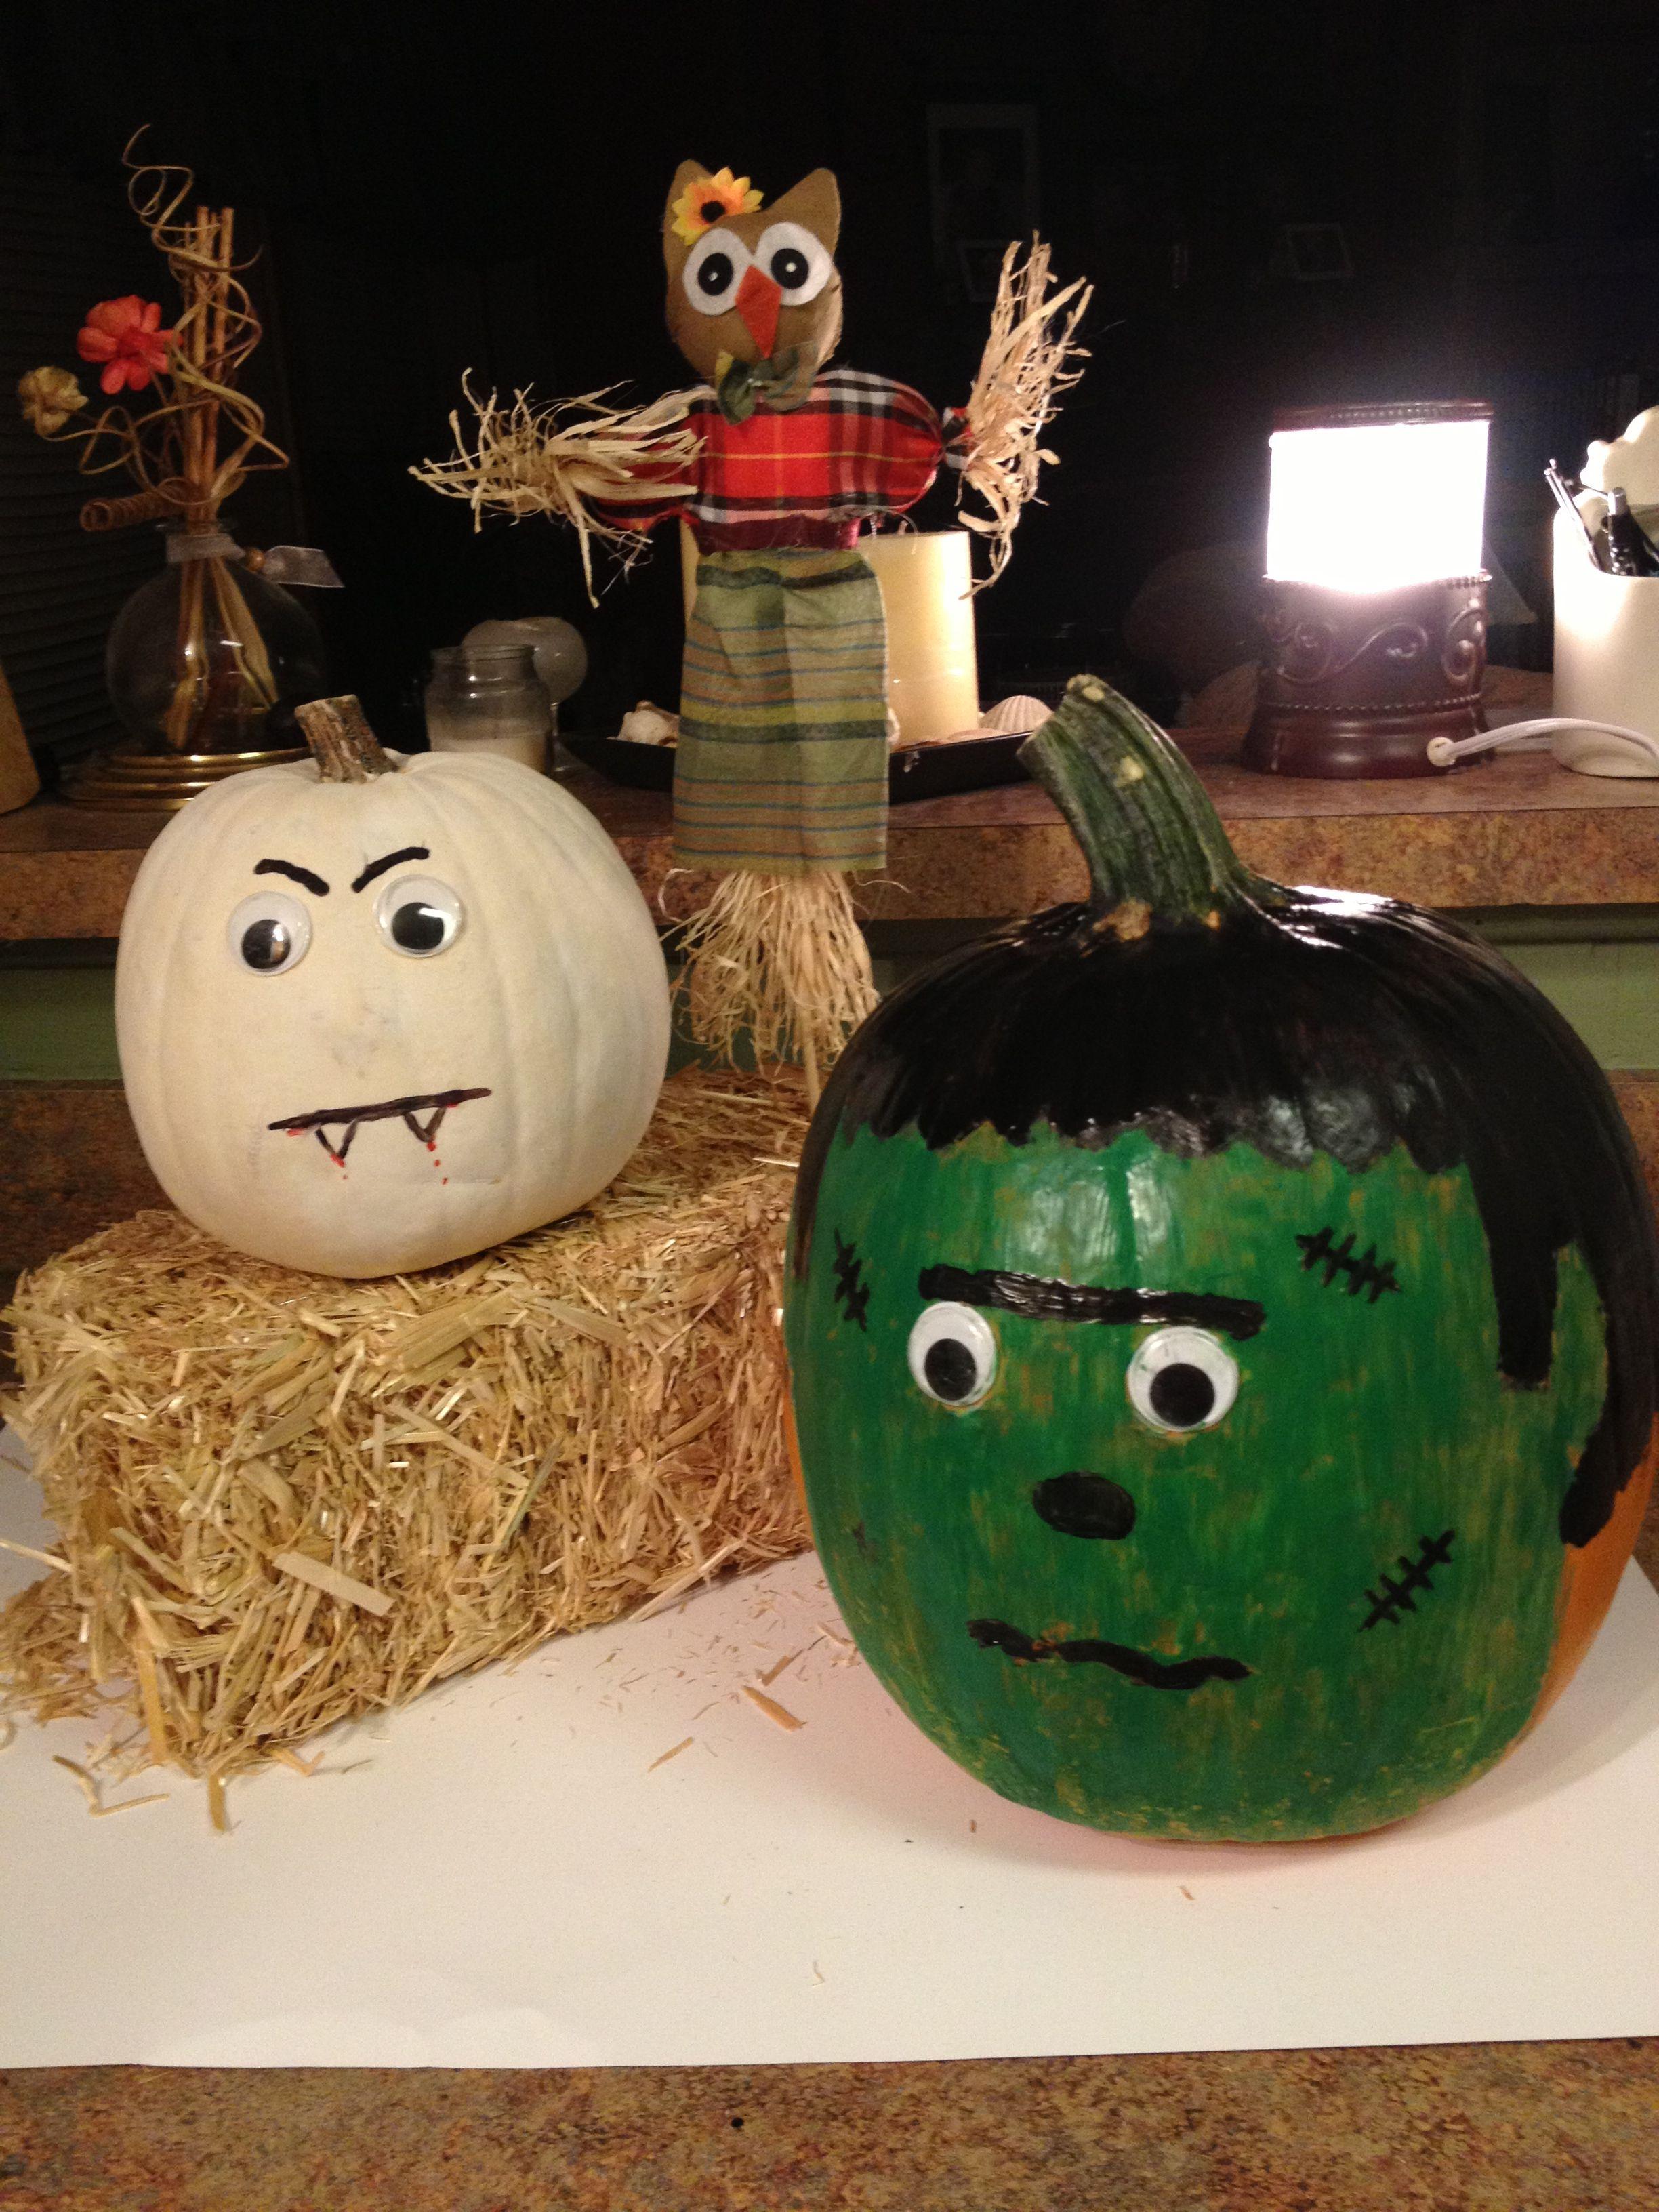 Painted pumpkins ) Painted pumpkins, Pumpkin decorating